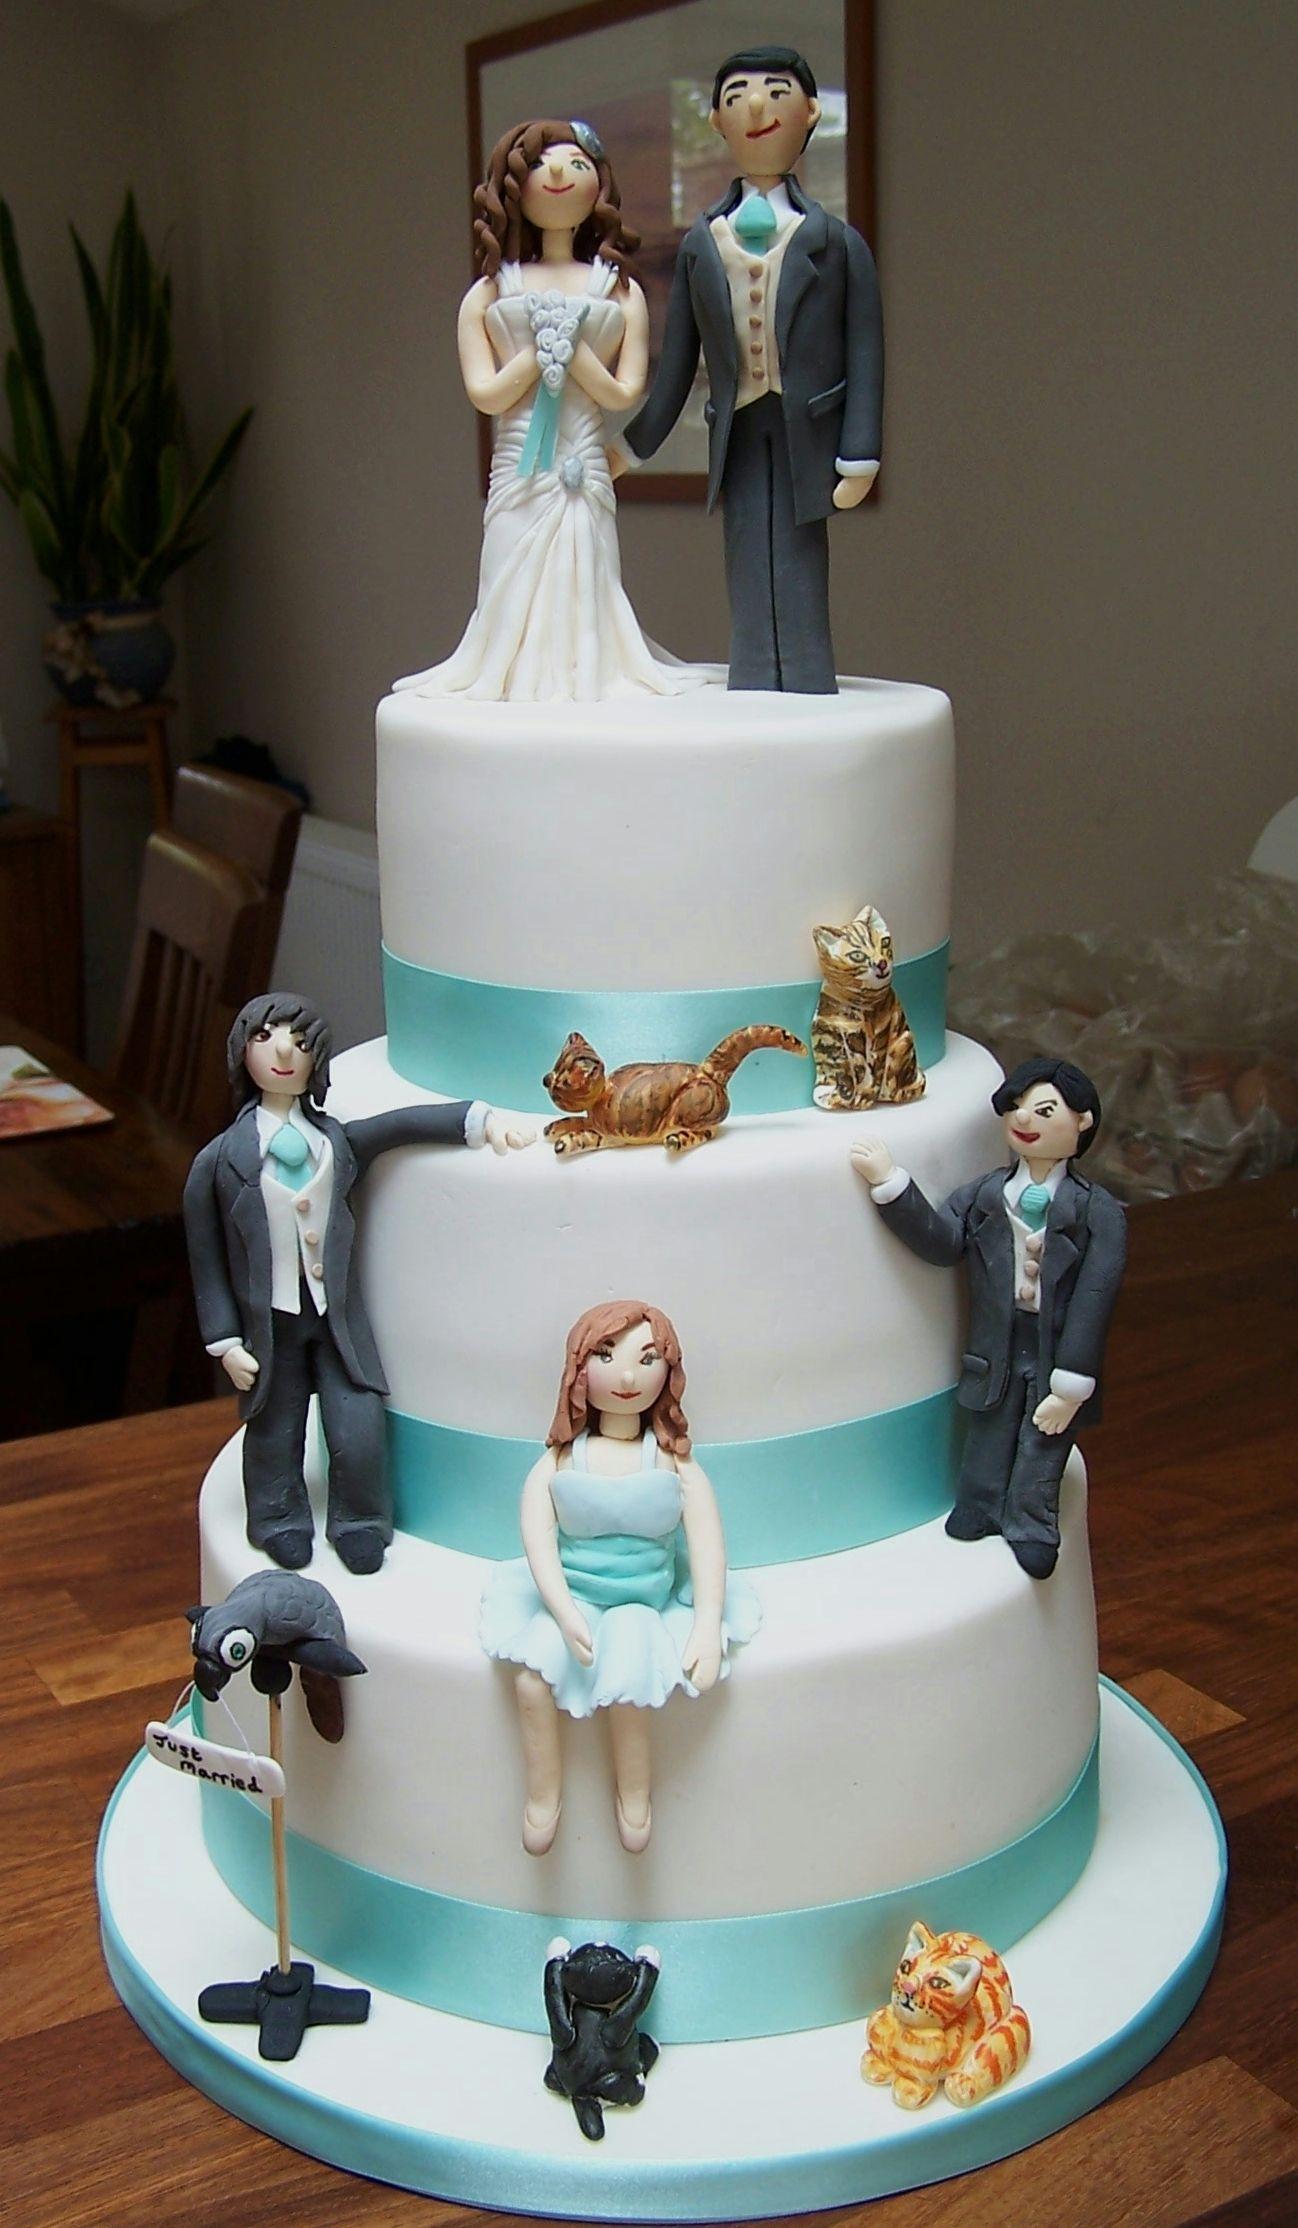 All The Family Fun Wedding Cake Cool Cakes Weird Addiction Mariage